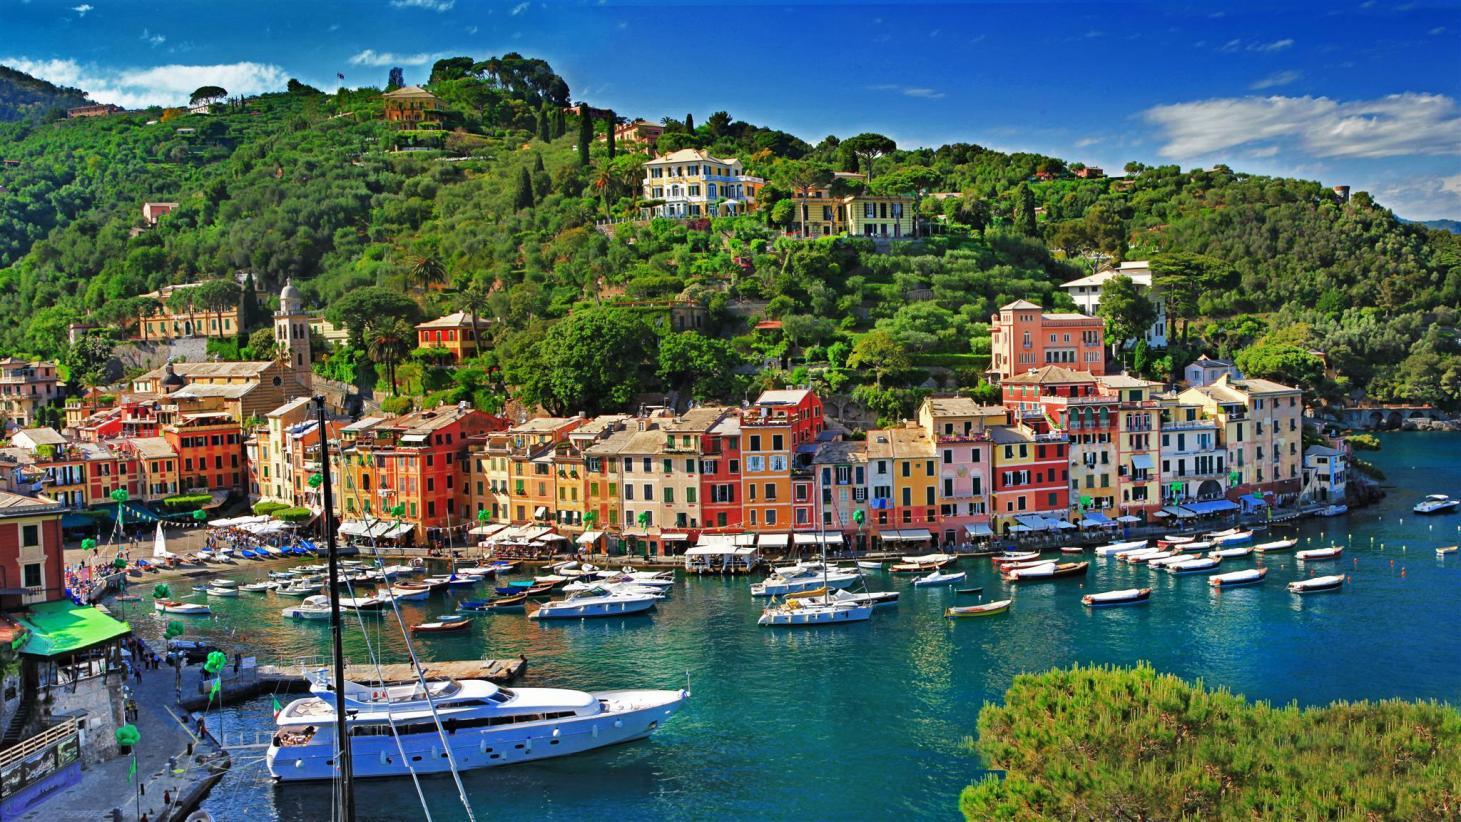 30 Best Genoa Hotels In 2020 Great Savings Reviews Of Hotels In Genoa Italy